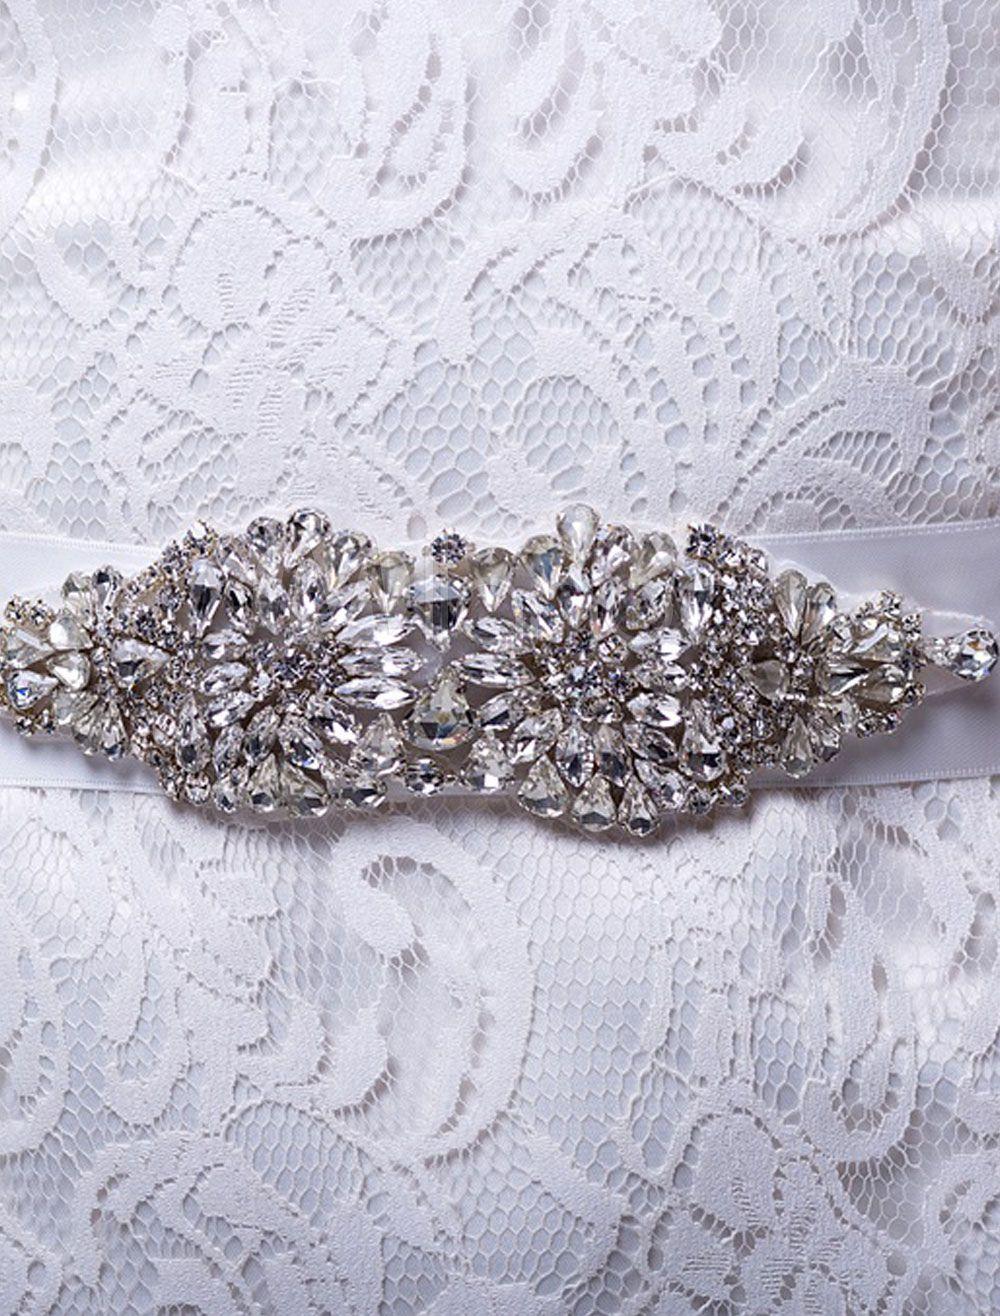 Marfil medio encantador marco de boda con diamantes de imitación ...